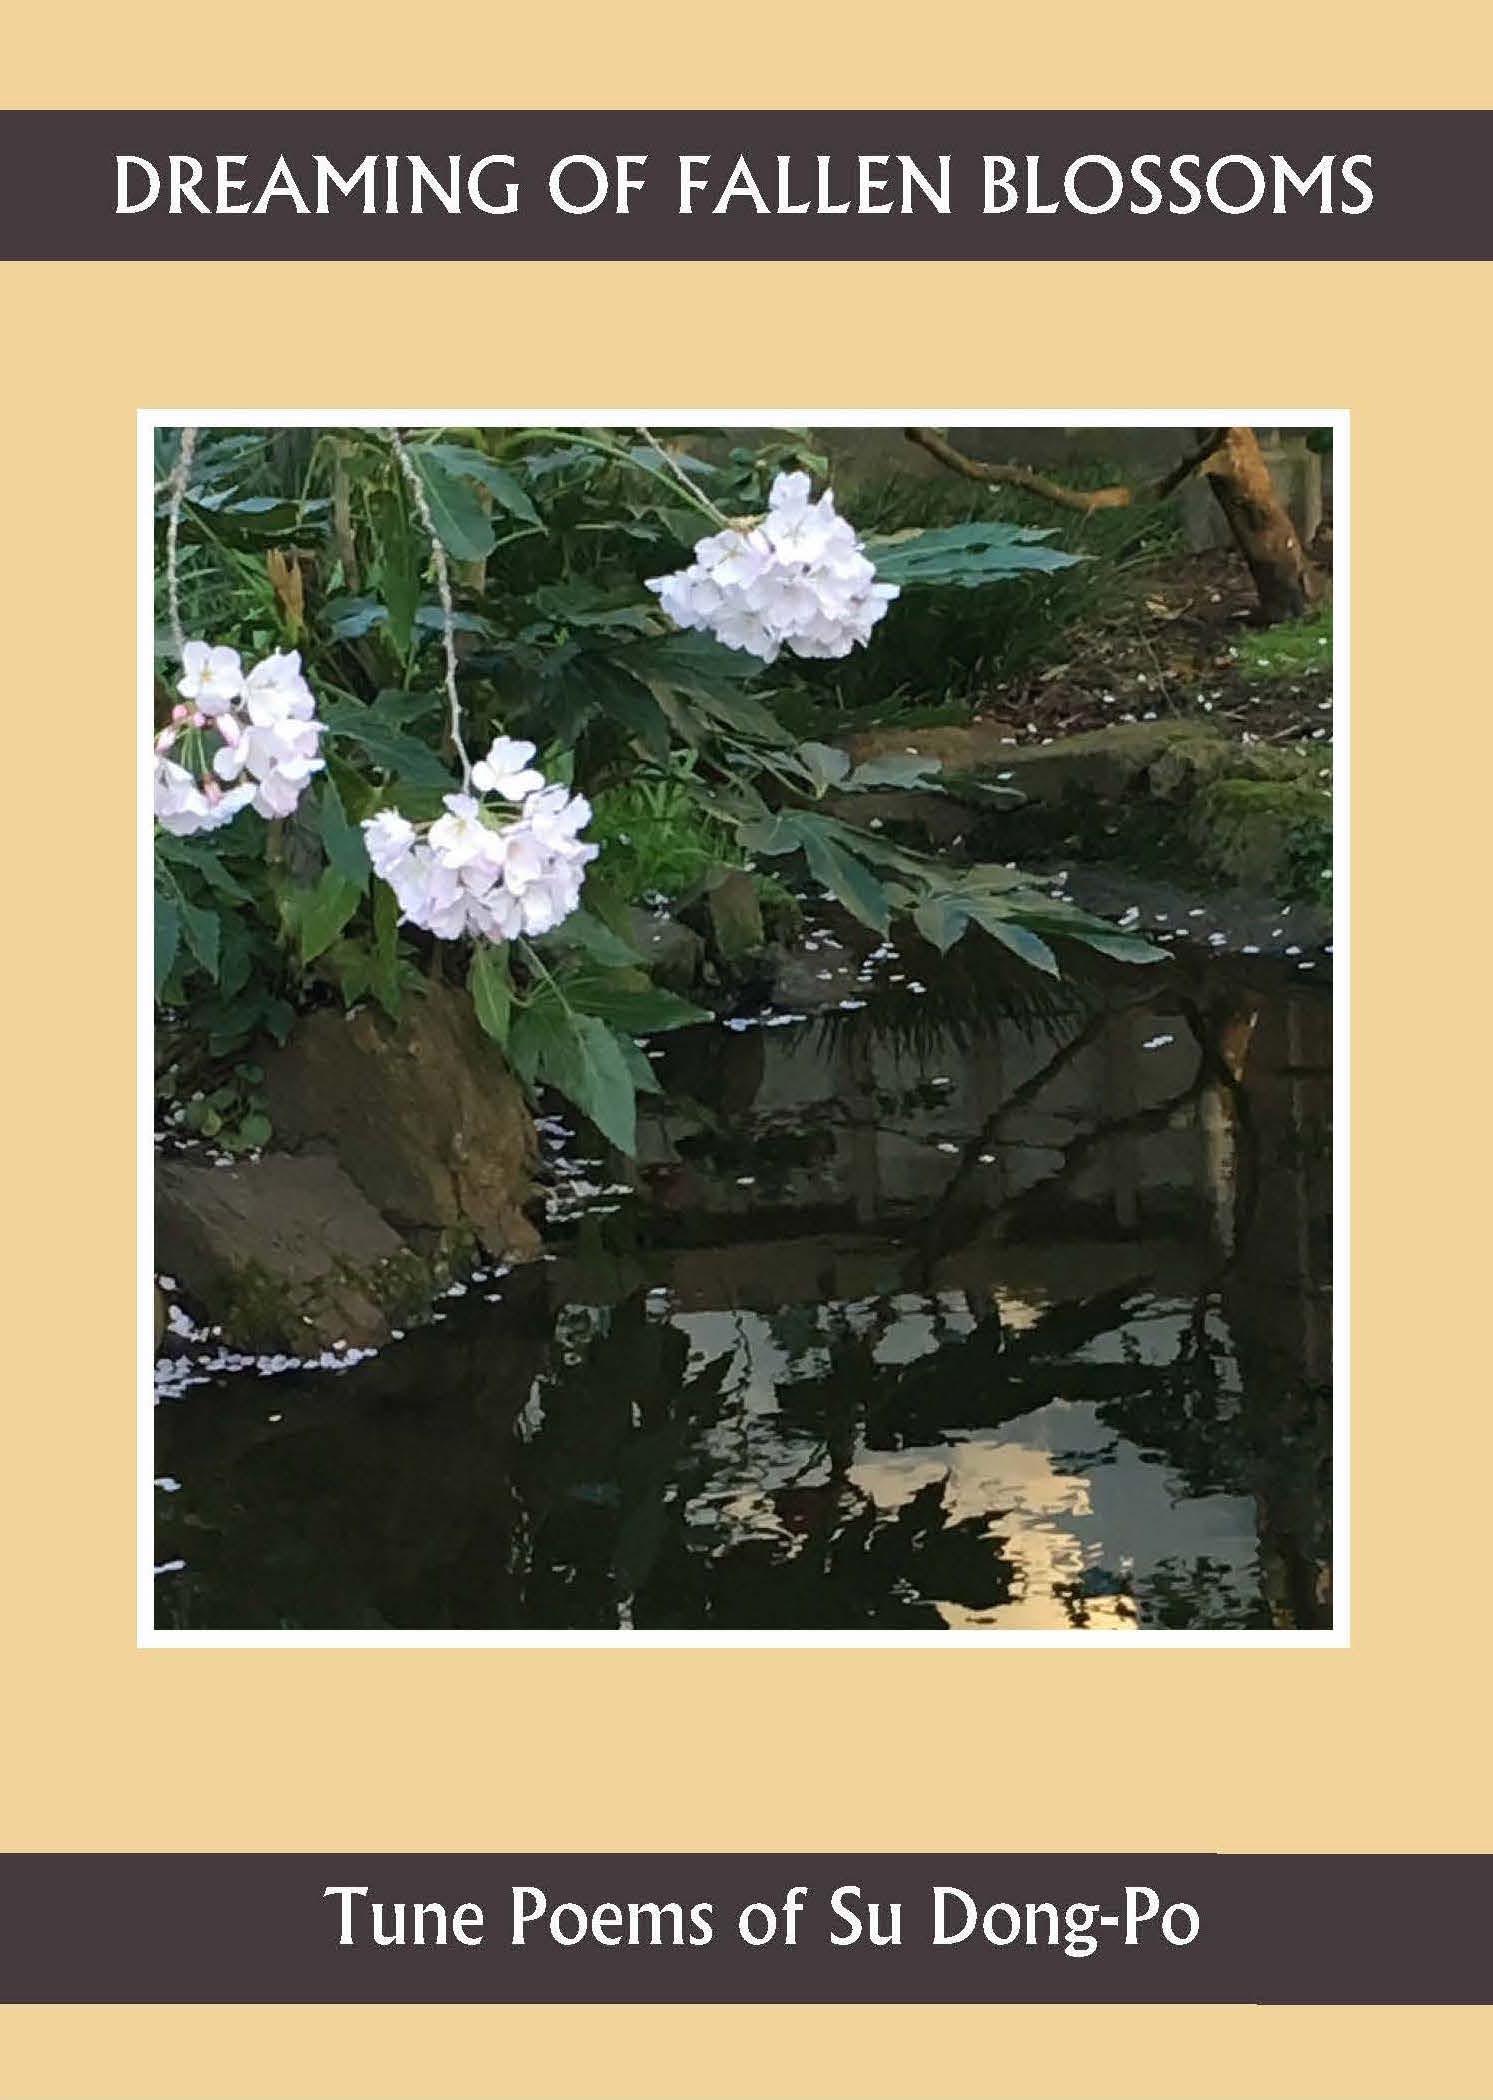 Fallen blossoms cover (2).jpg